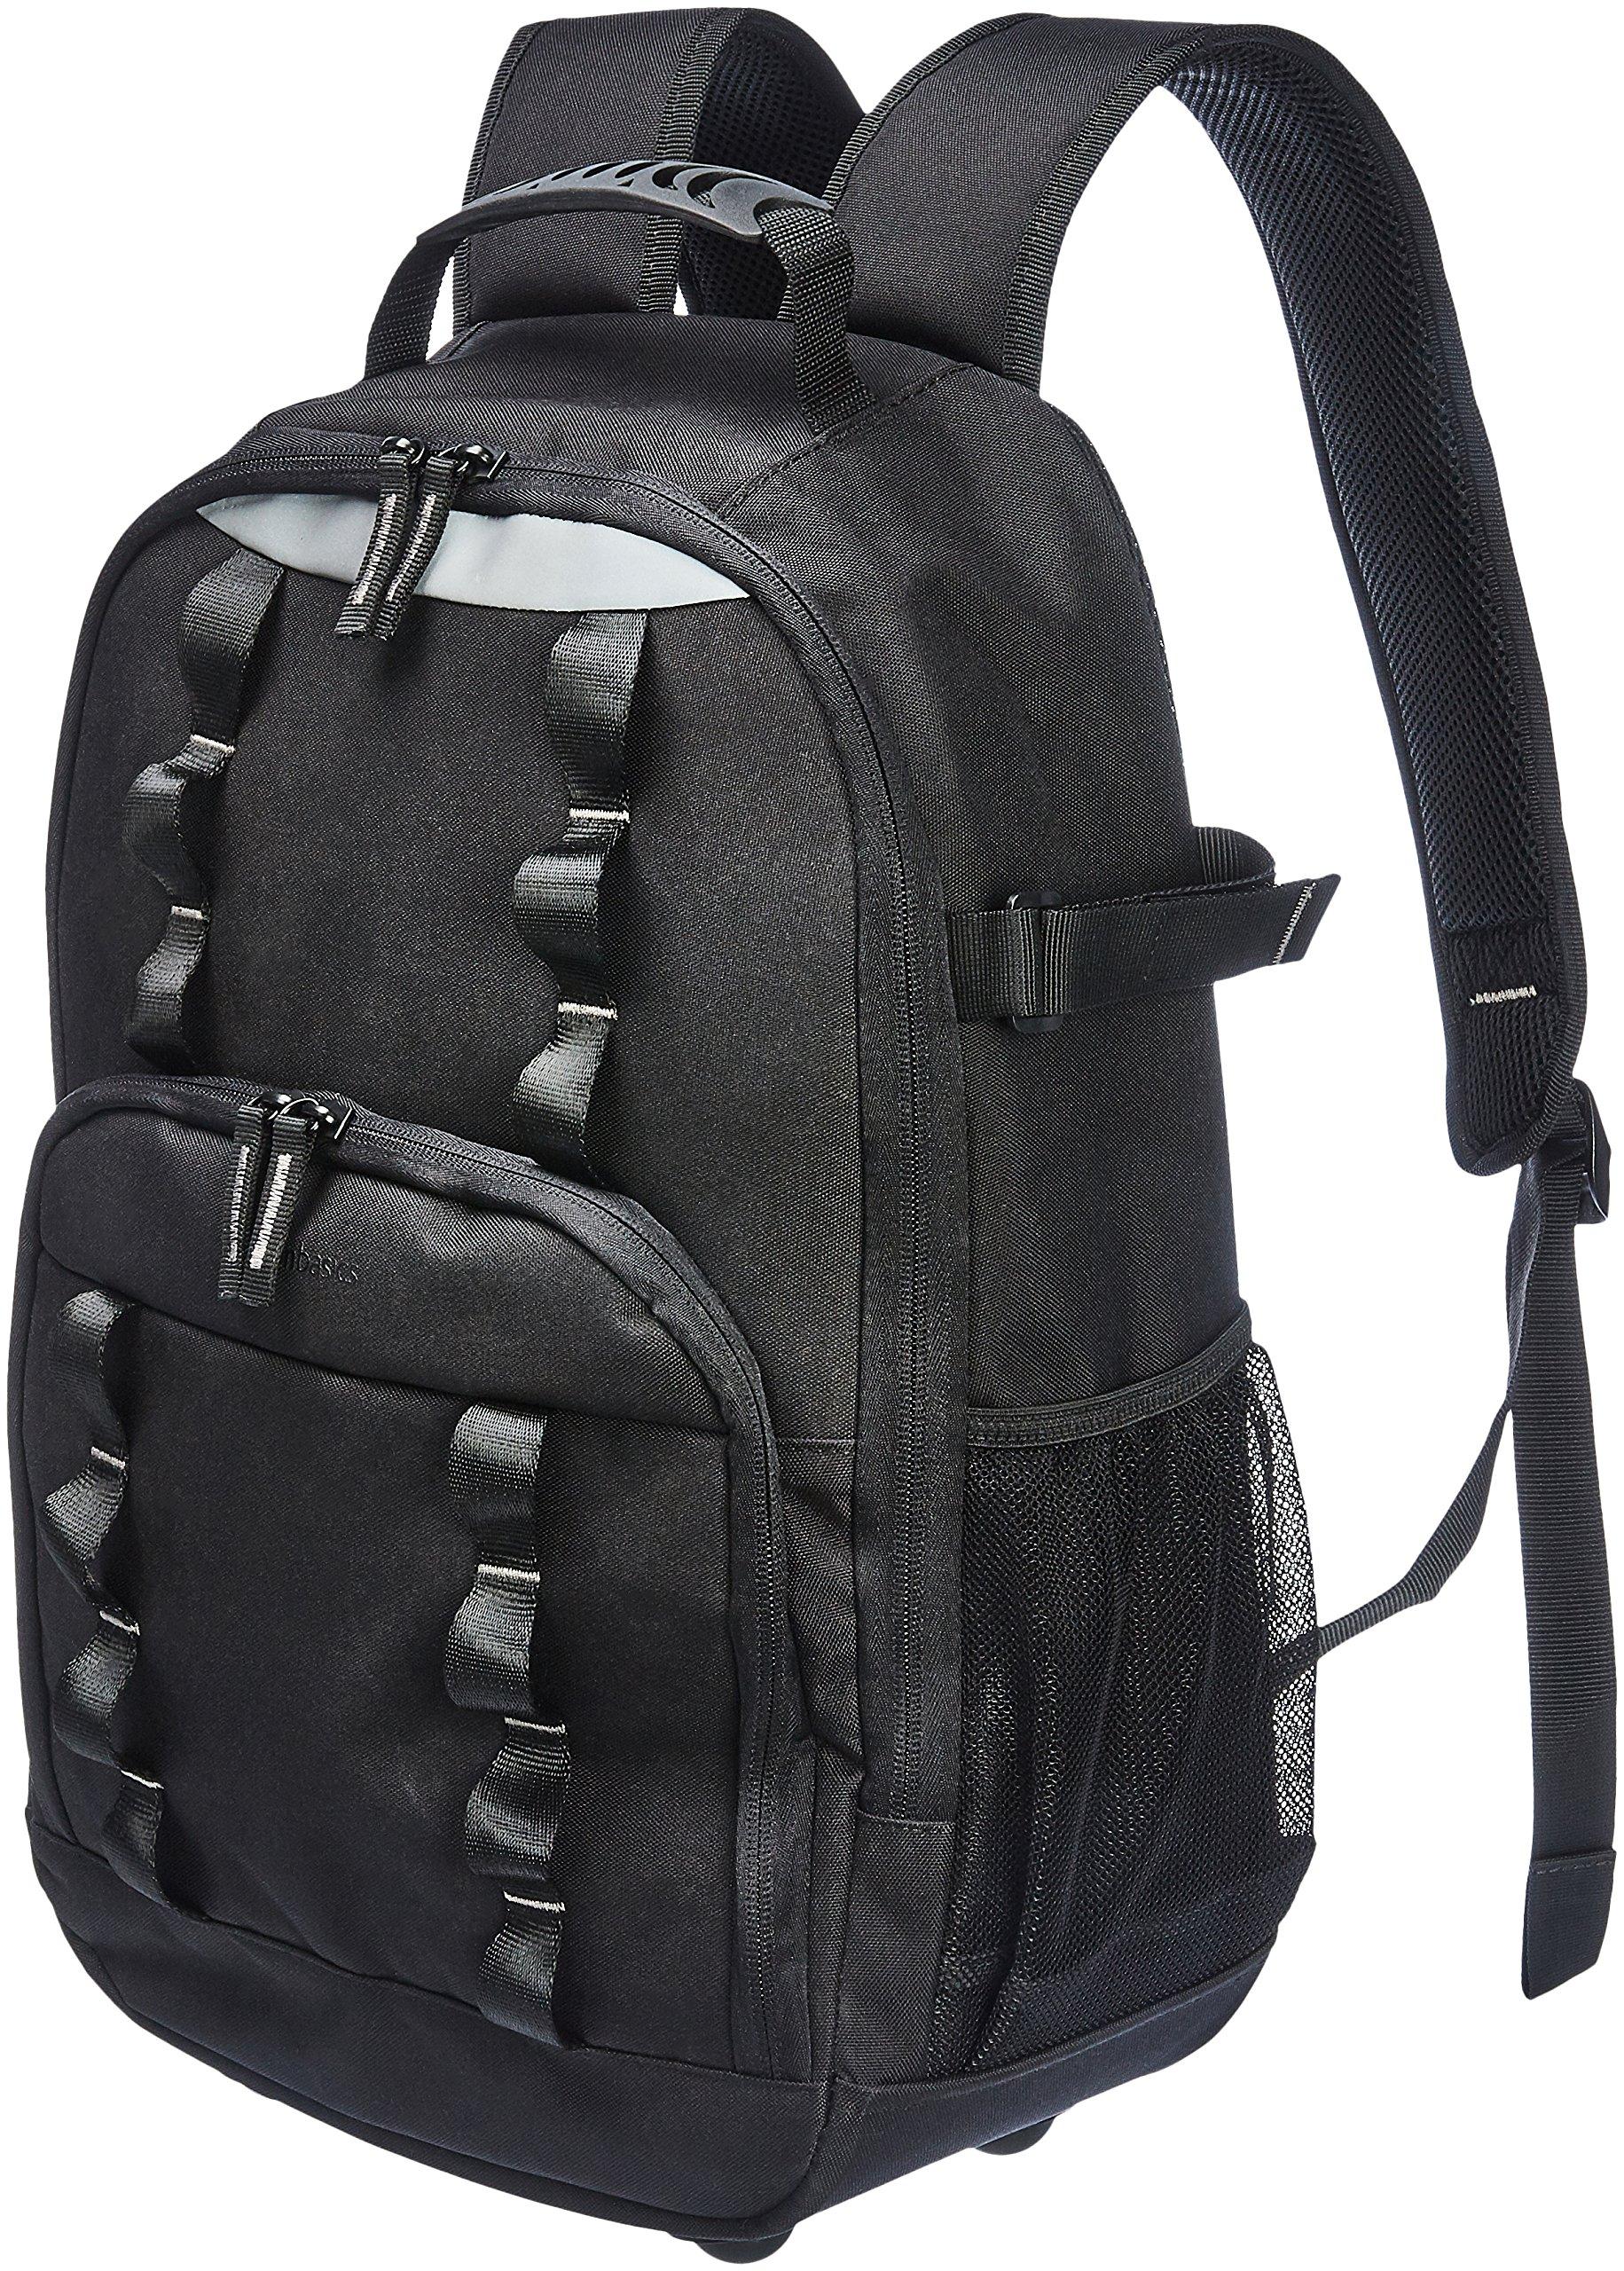 AmazonBasics Tool Bag Backpack - 22-Pocket with Utility Loops